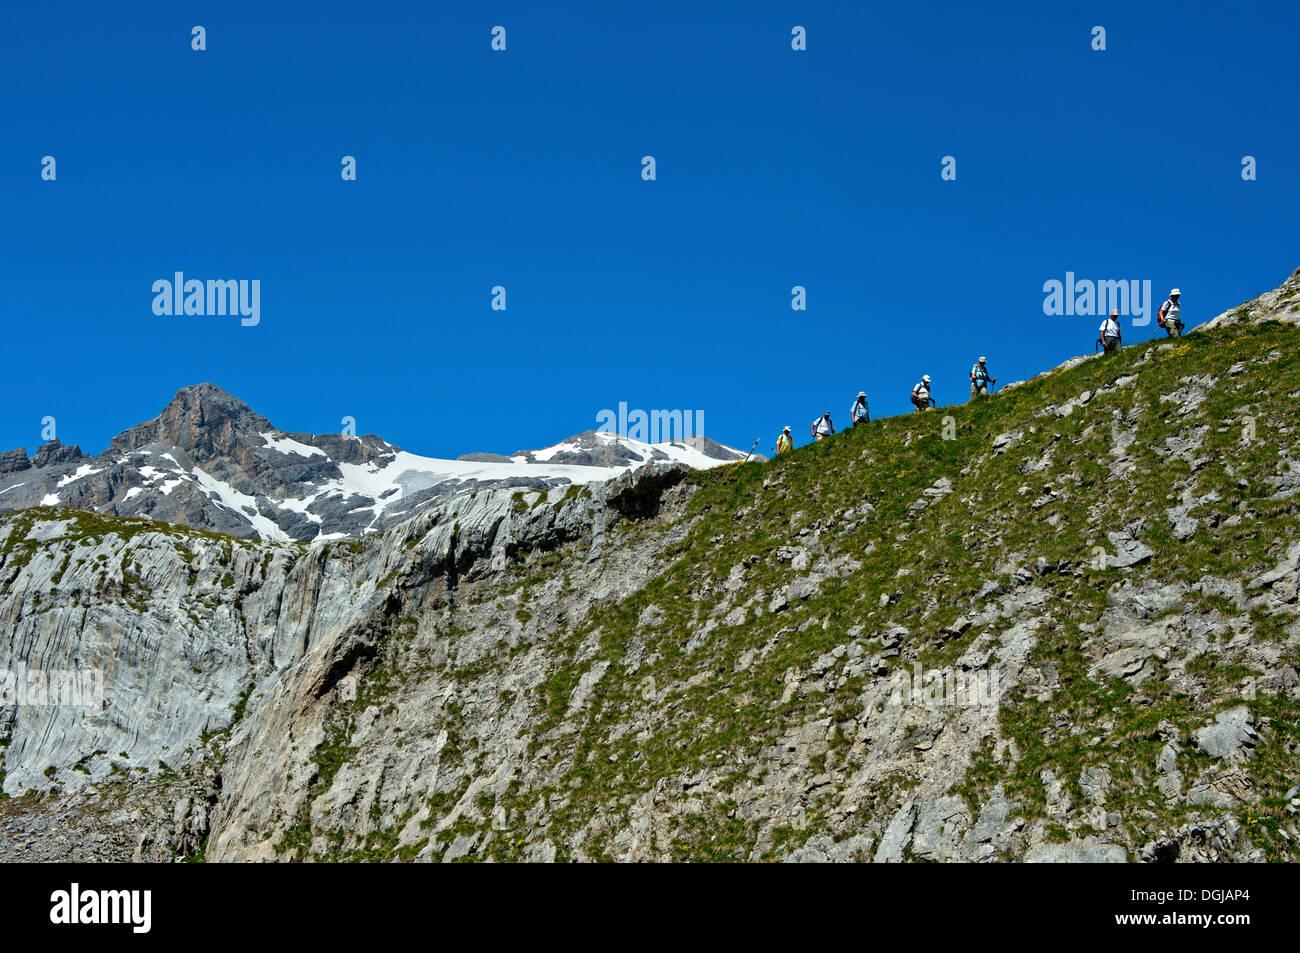 Hikers below the summit of Wildhorn Mountain, Bernese Alps, Canton of Valais, Switzerland Stock Photo